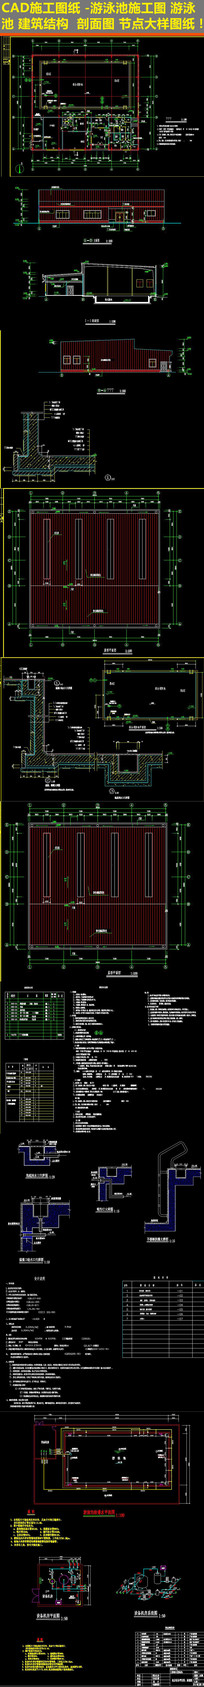 CAD游泳池建筑节点施工图